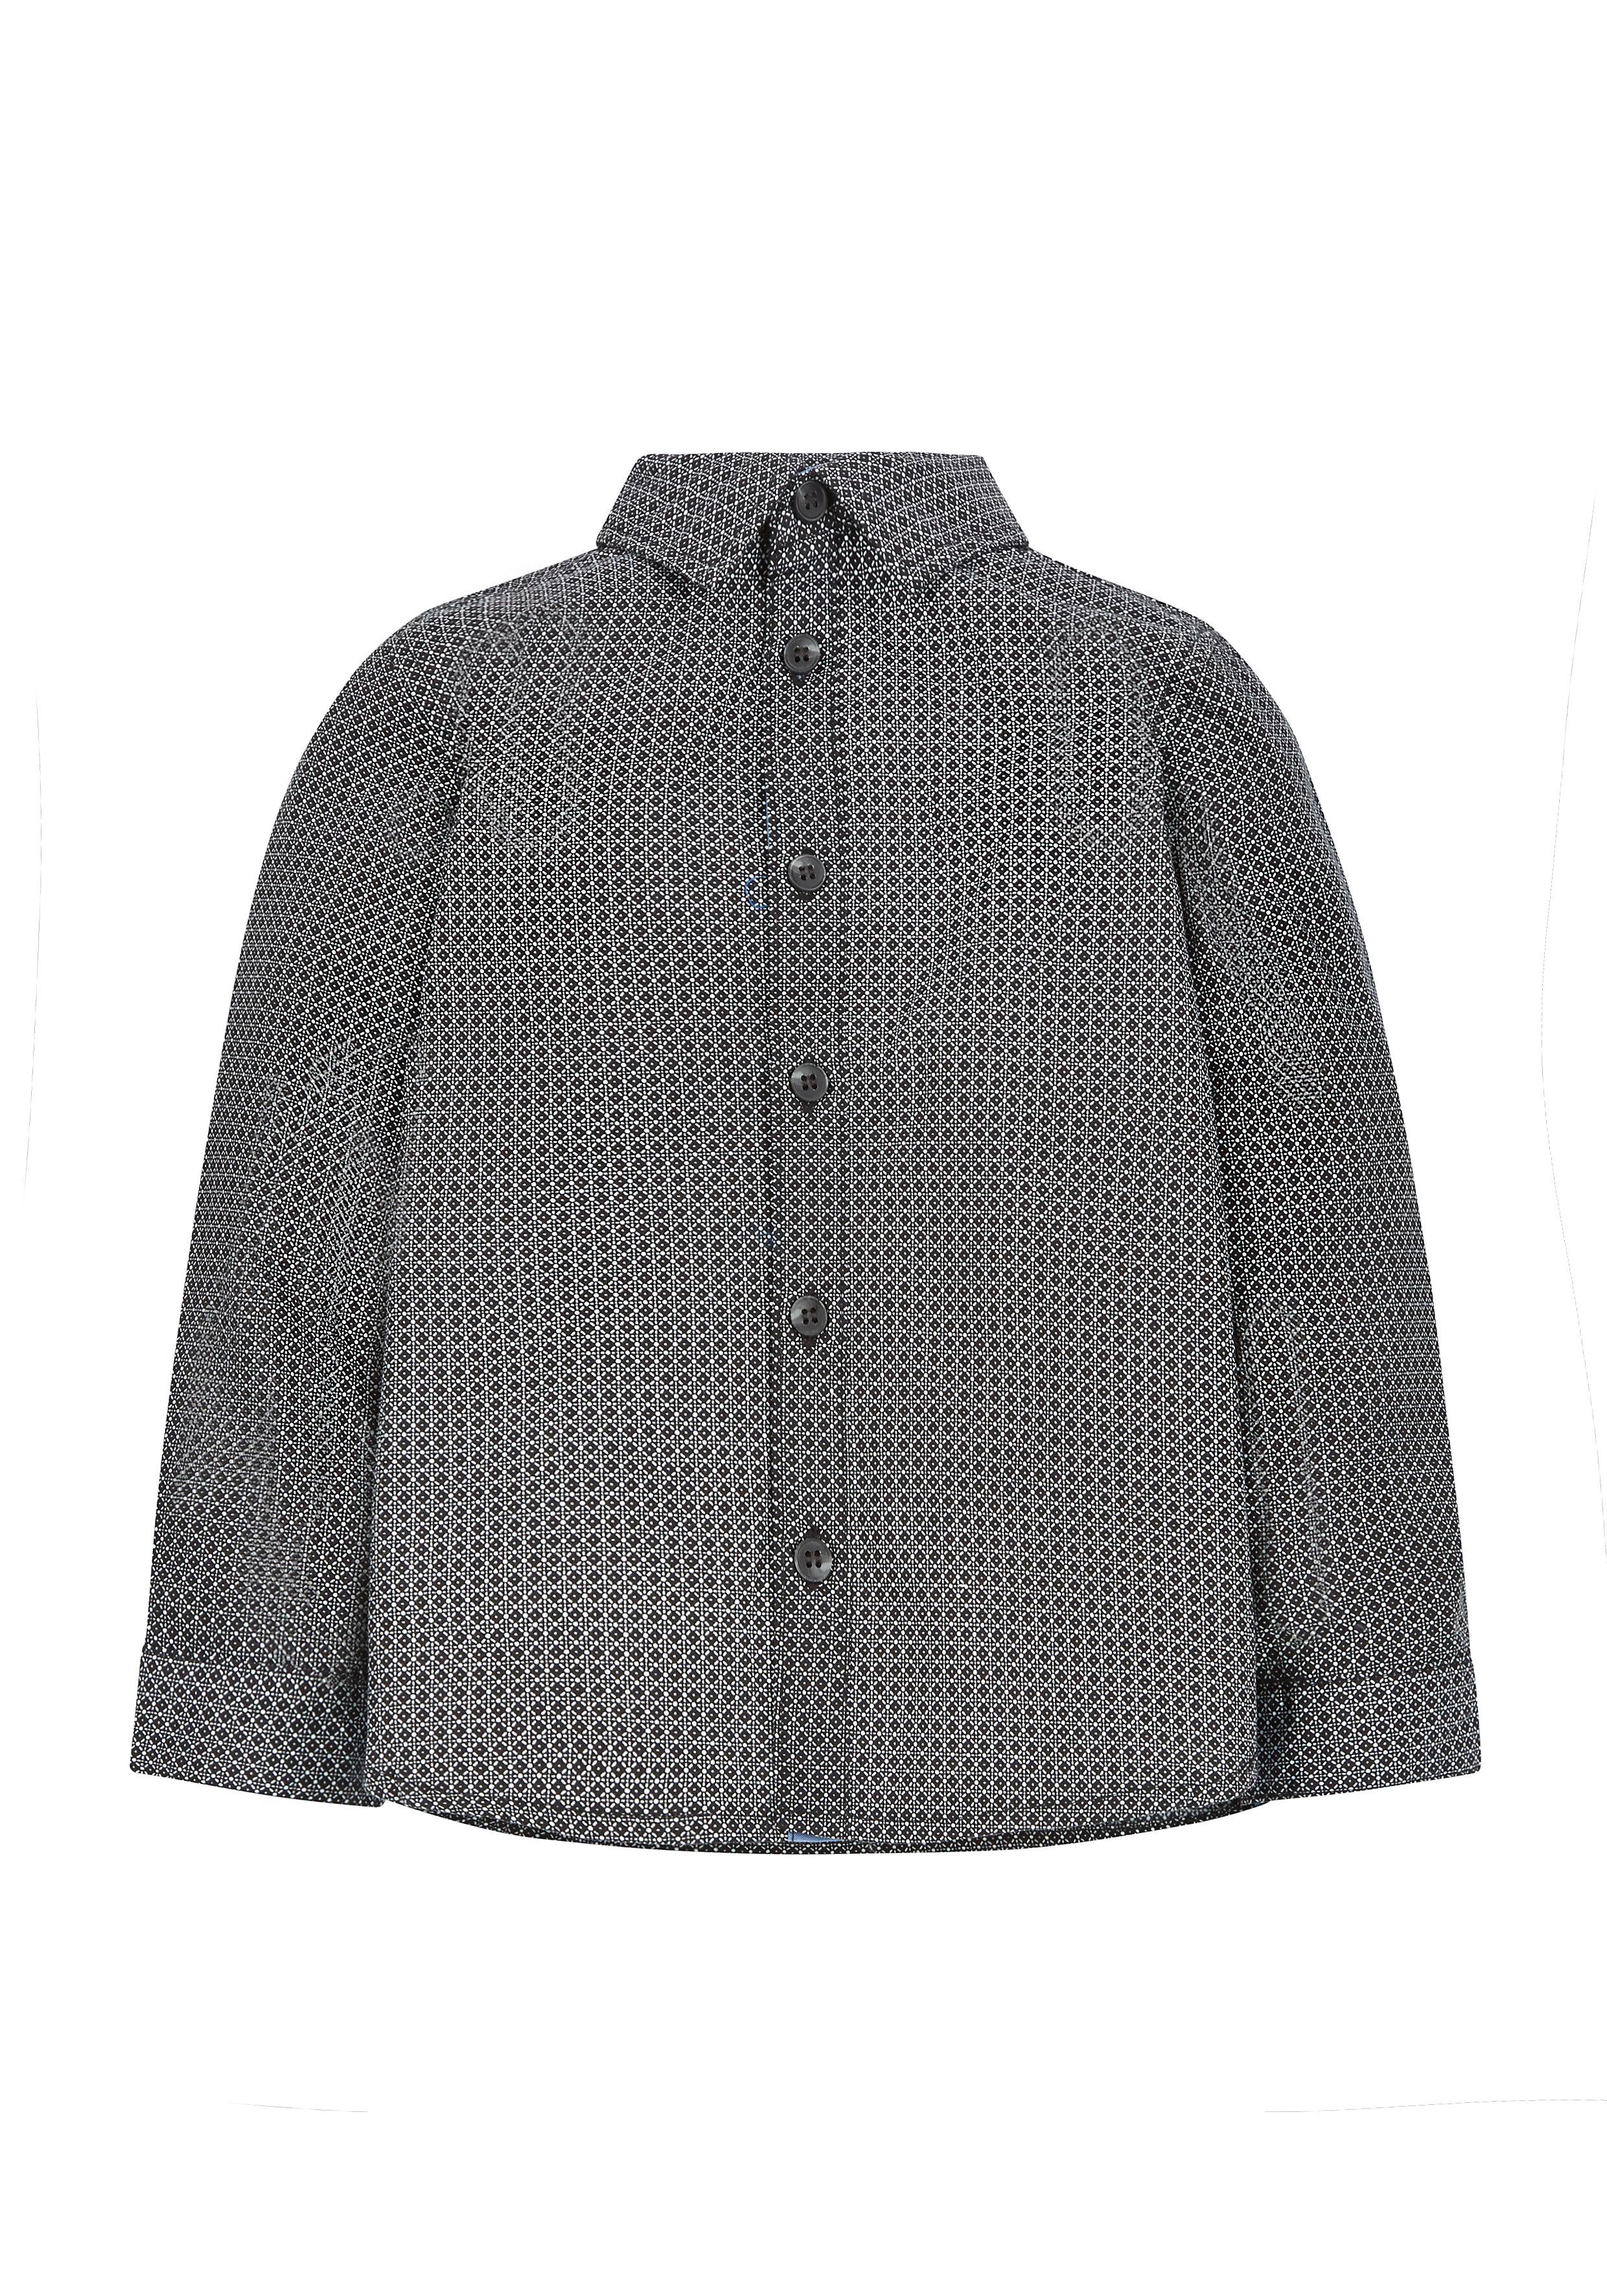 Mothercare | Boys Geo Shirt - Black